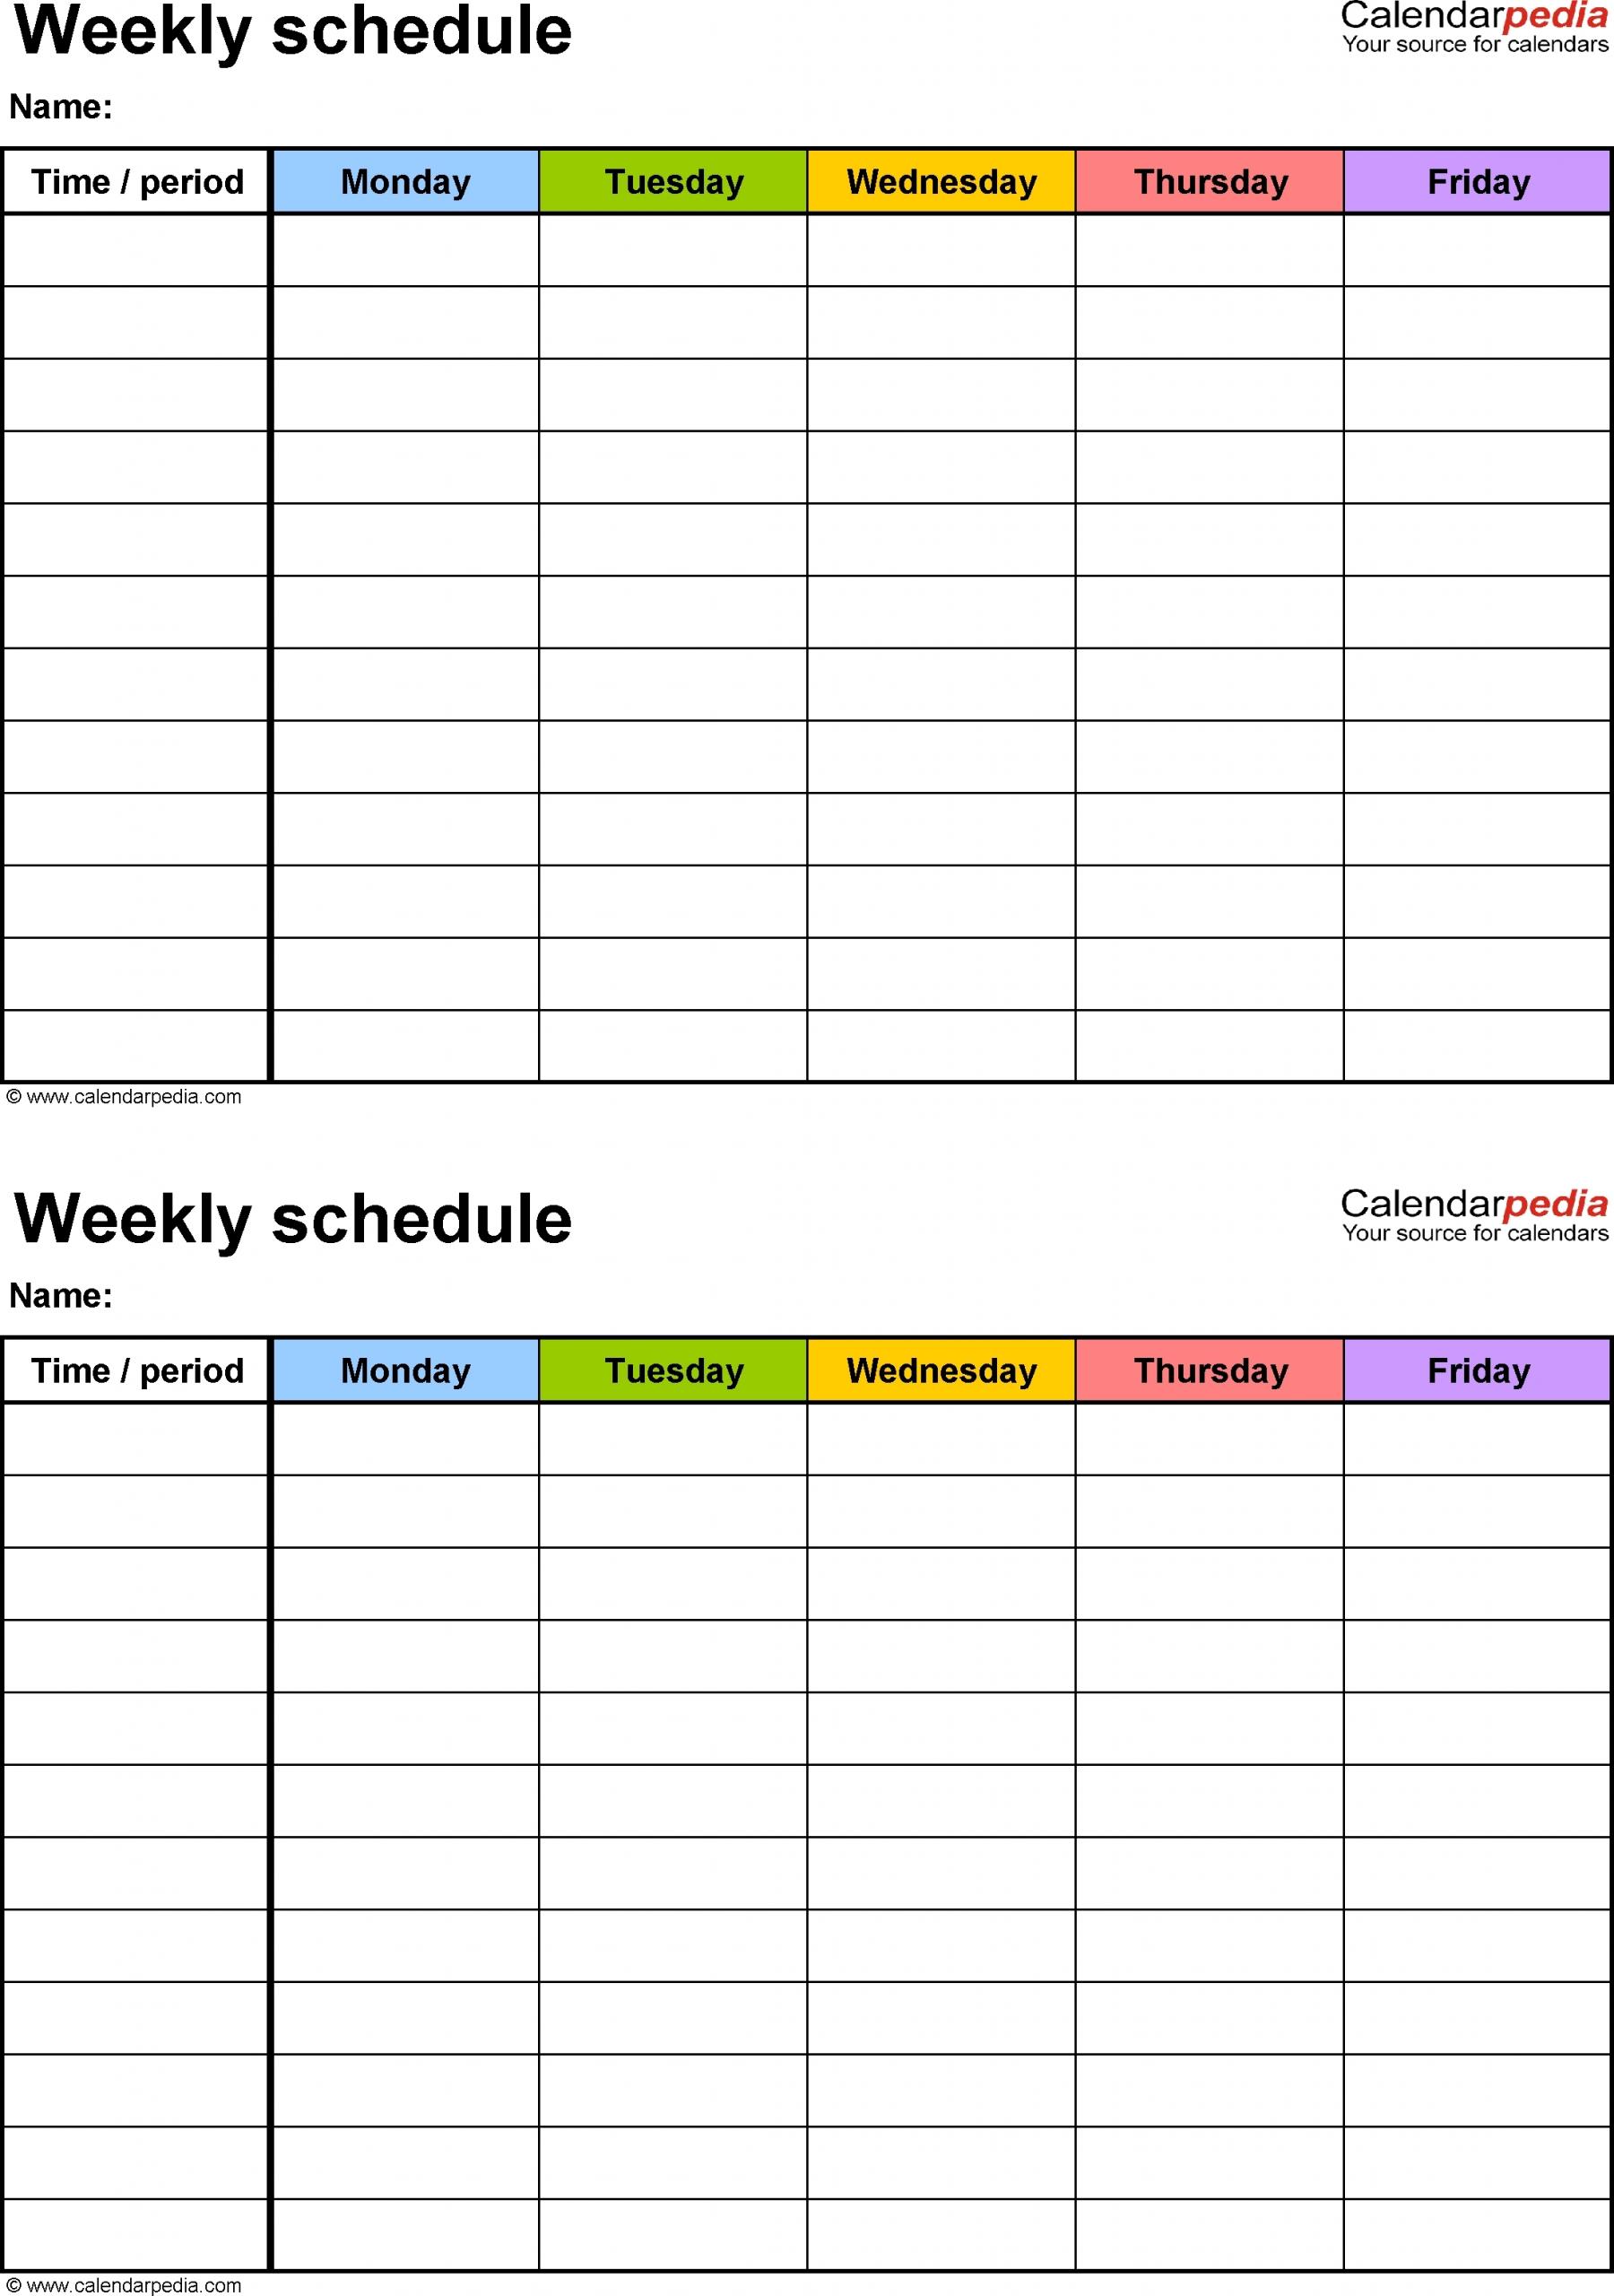 free printable 7 day weekly calendar | month calendar